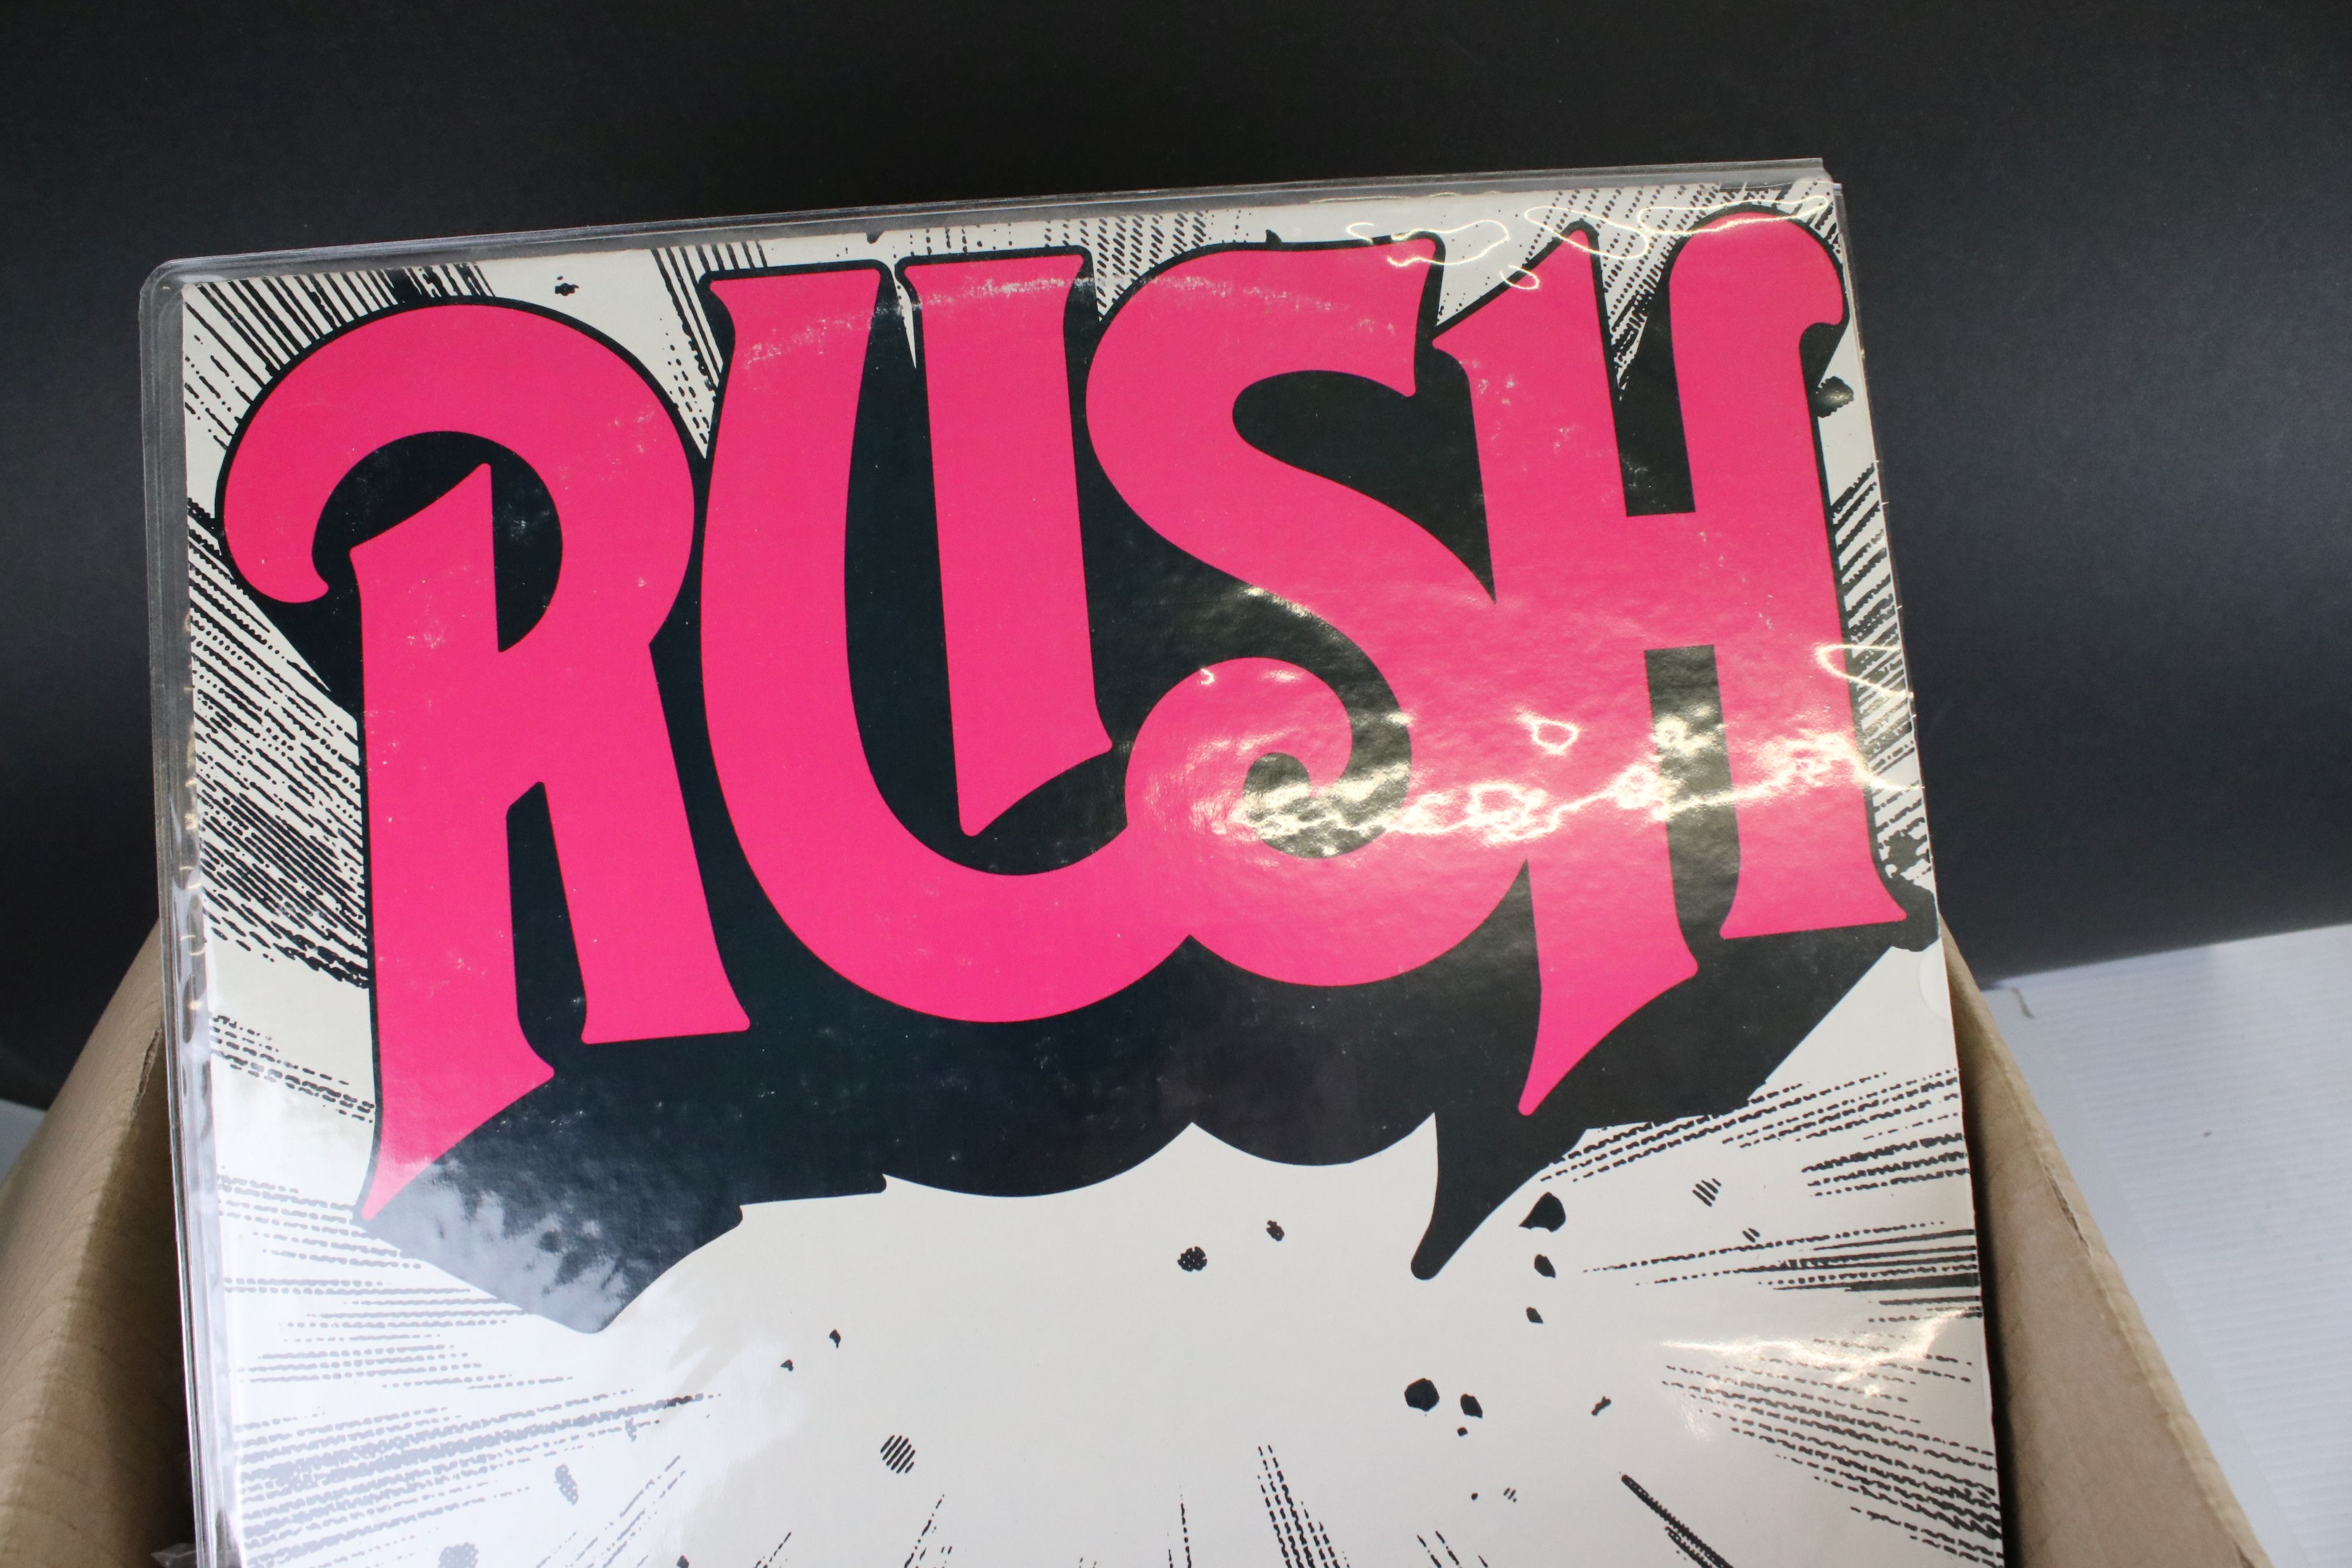 Vinyl - Around 65 US Rock LPs to include Rush, Todd Rundgren, Kiss, Steeley Dan, Lone Star etc, - Image 4 of 9